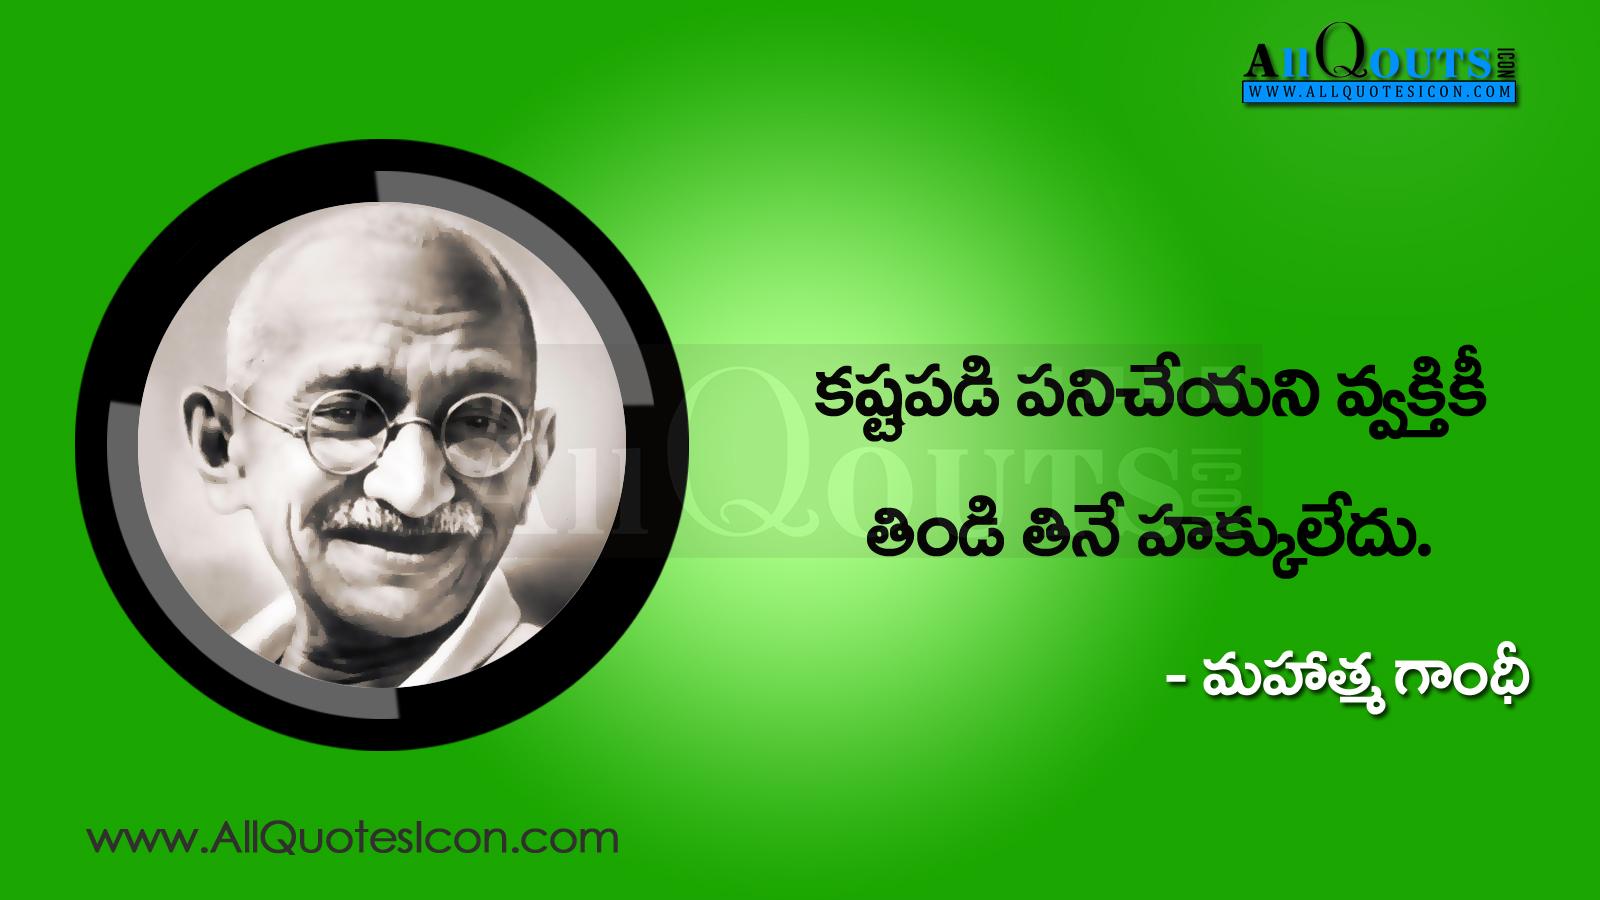 Here Is A Mahatma Gandhi Life Quotes In Telugu, Mahatma - Gandhi Quotations In Telugu - HD Wallpaper